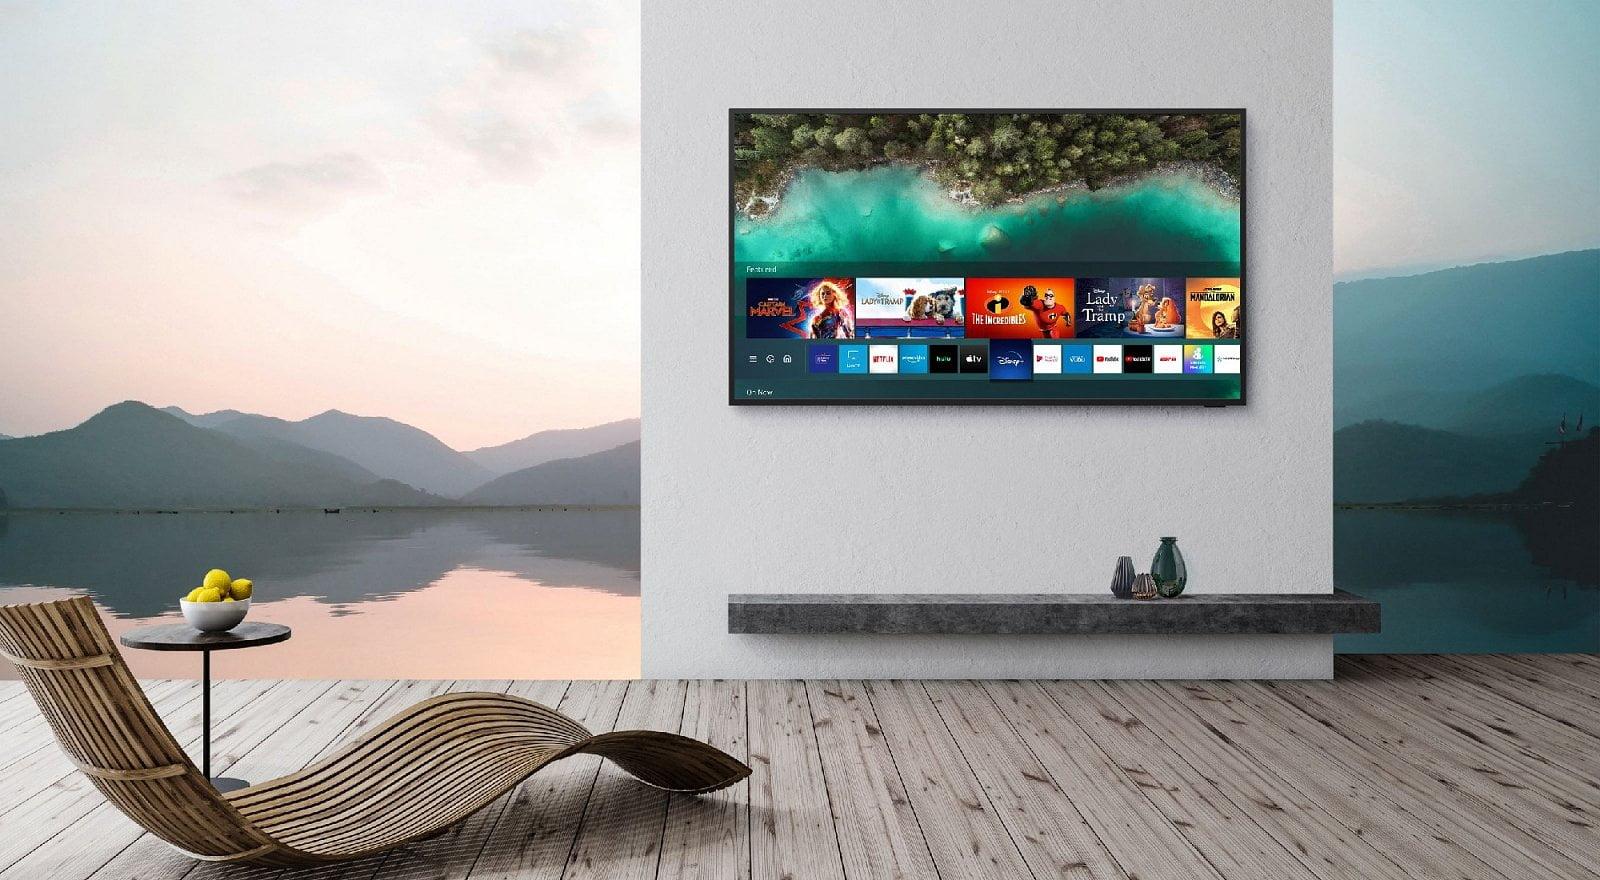 Samsung Terrace TV a soundbar